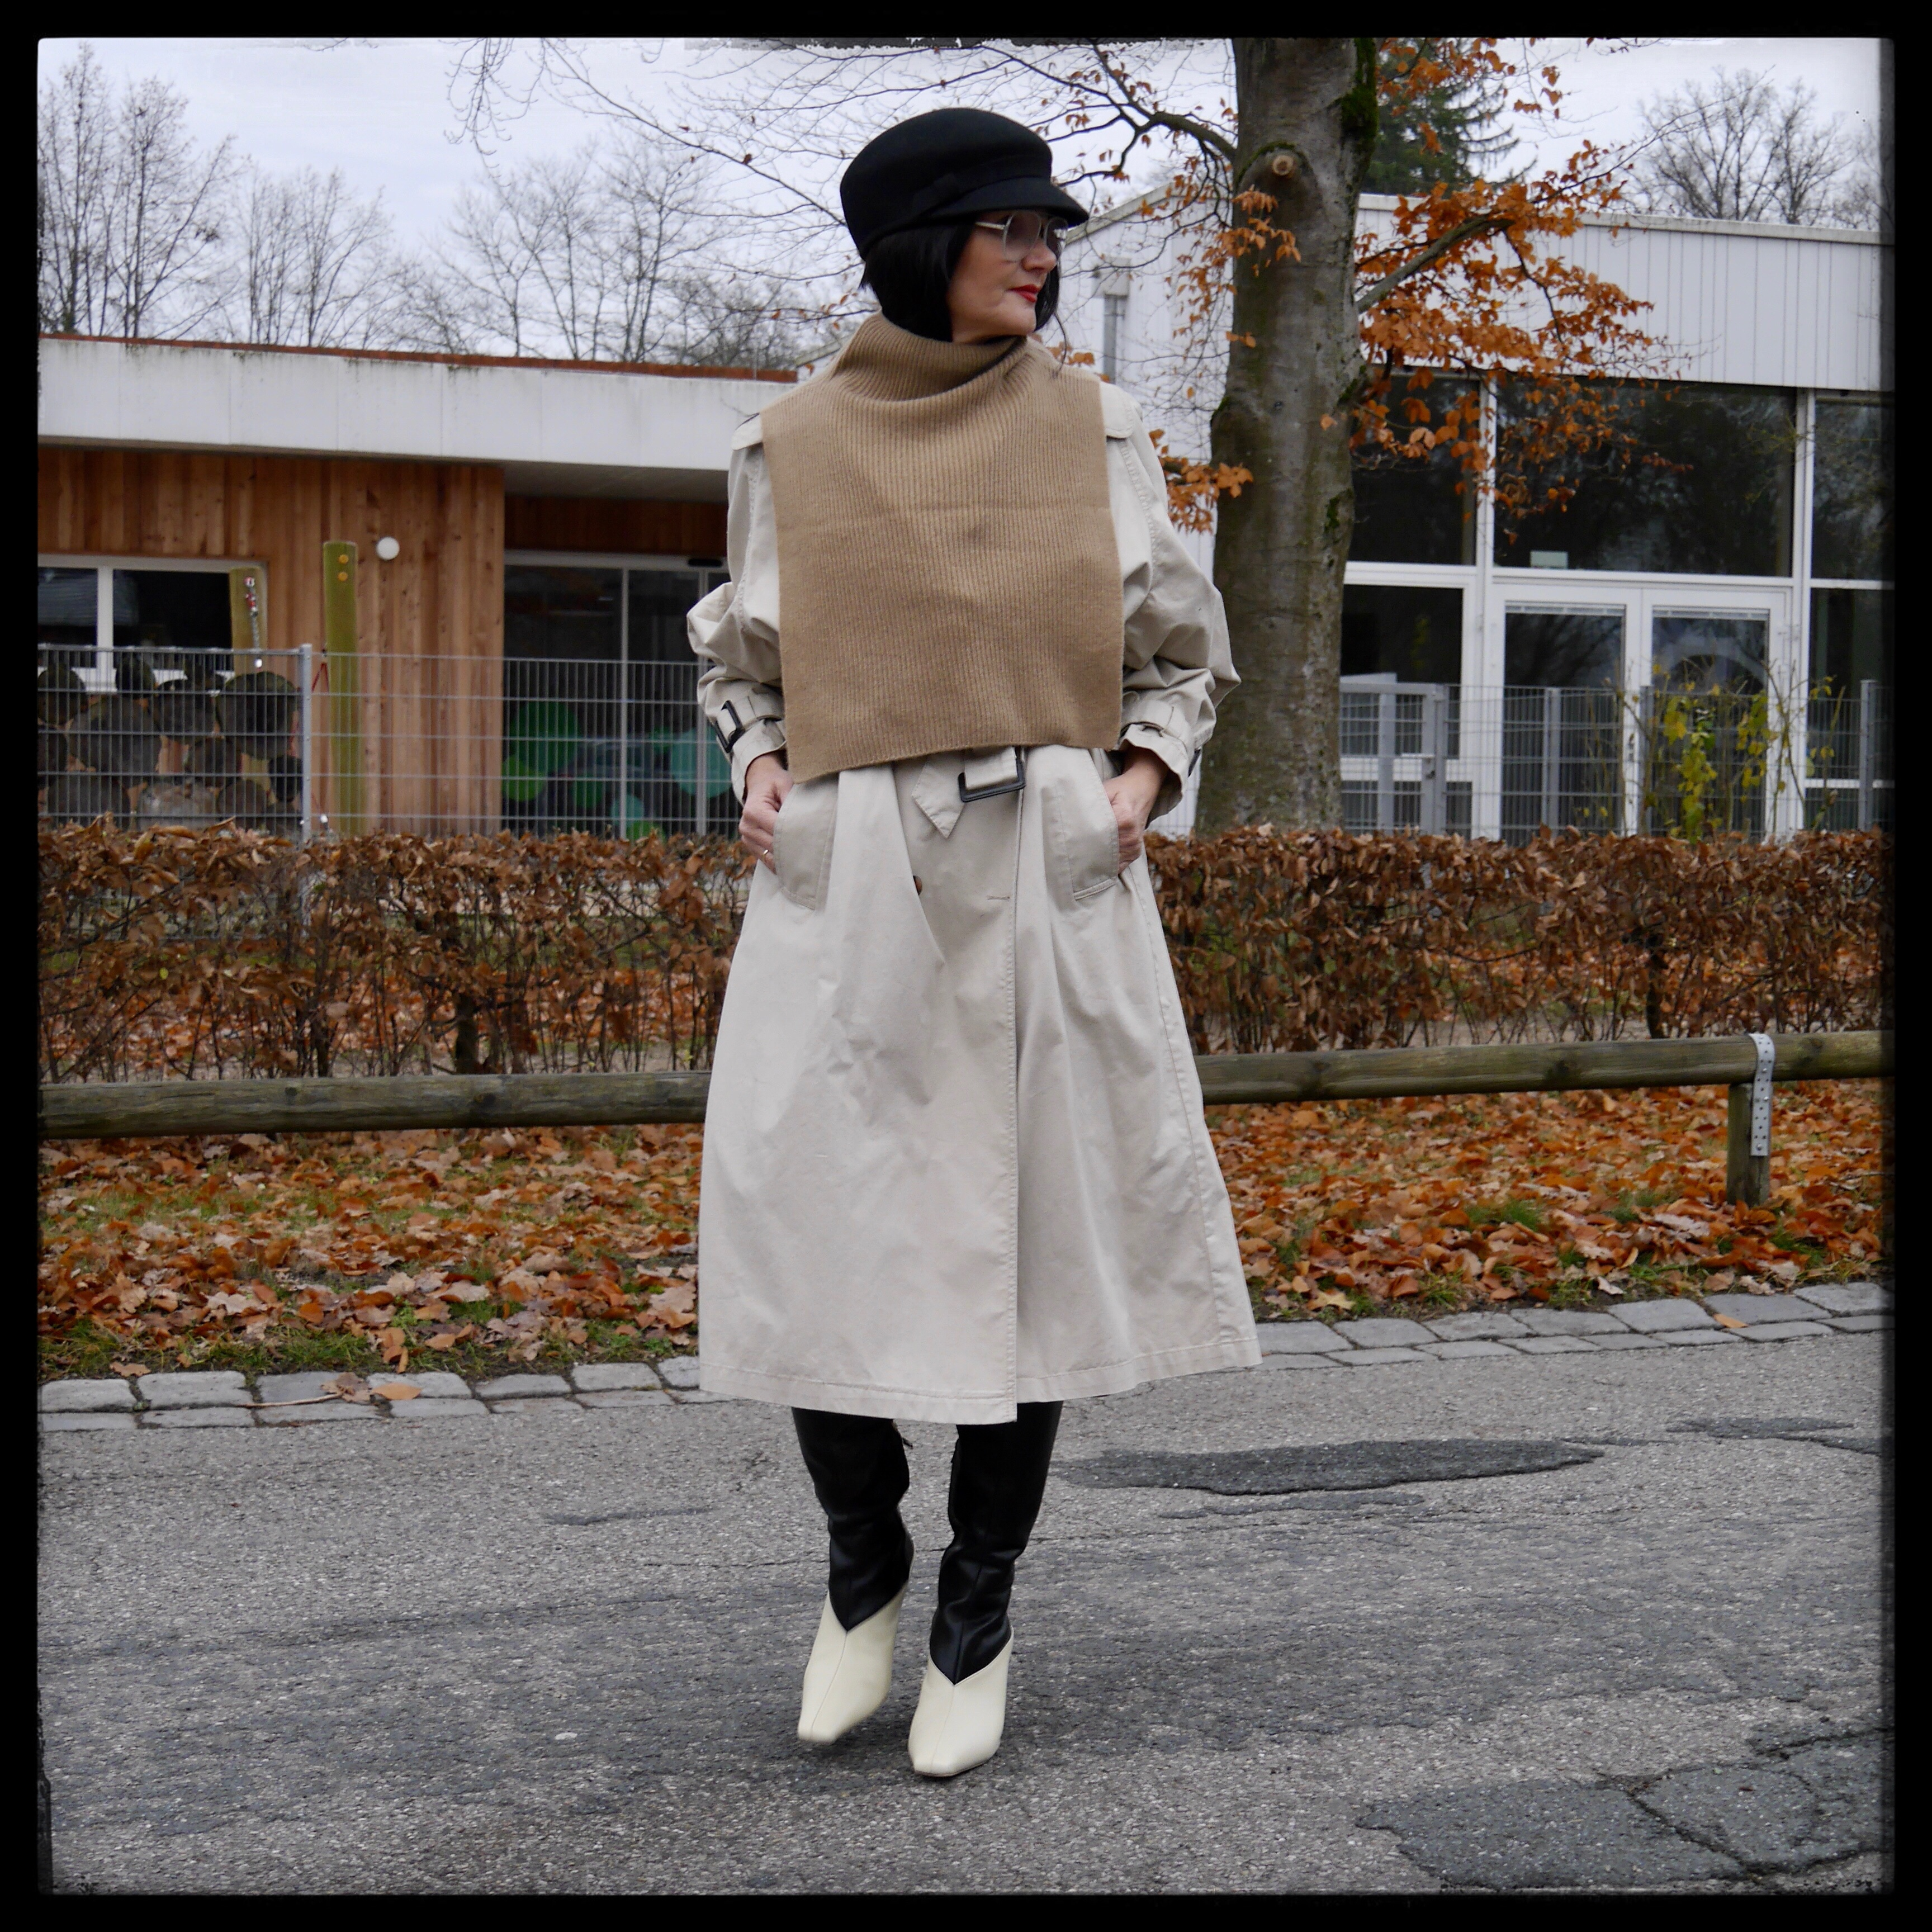 Pullunder über Trenchcoat, Mantel, Cashmere, Studio-Collection Stiefel, H&M-Studio